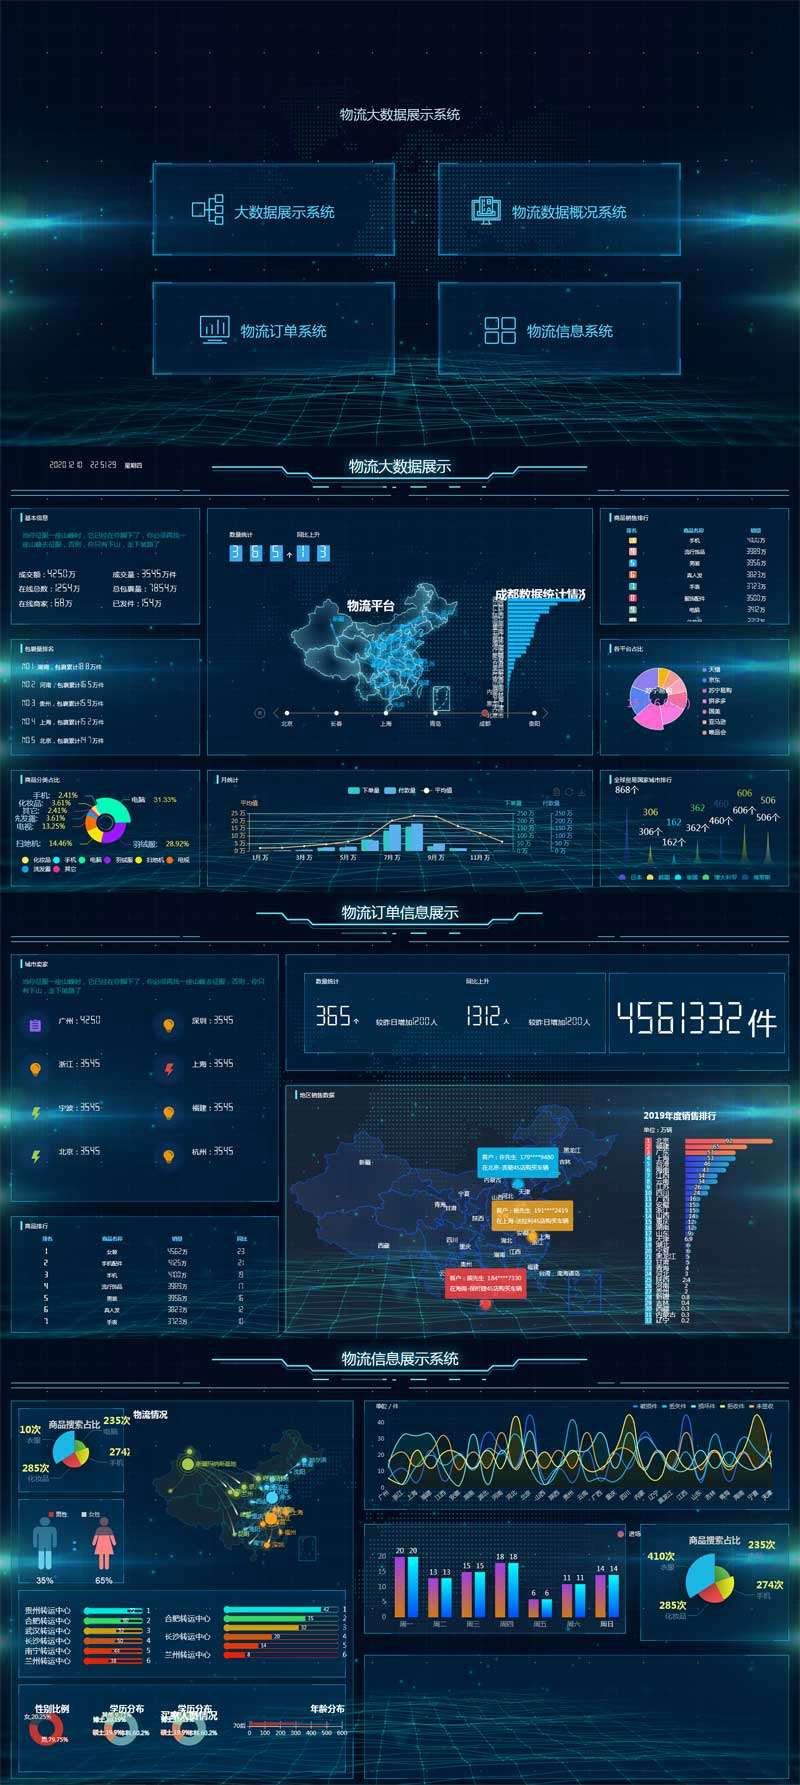 html5全屏物流信息大数据展示界面模板